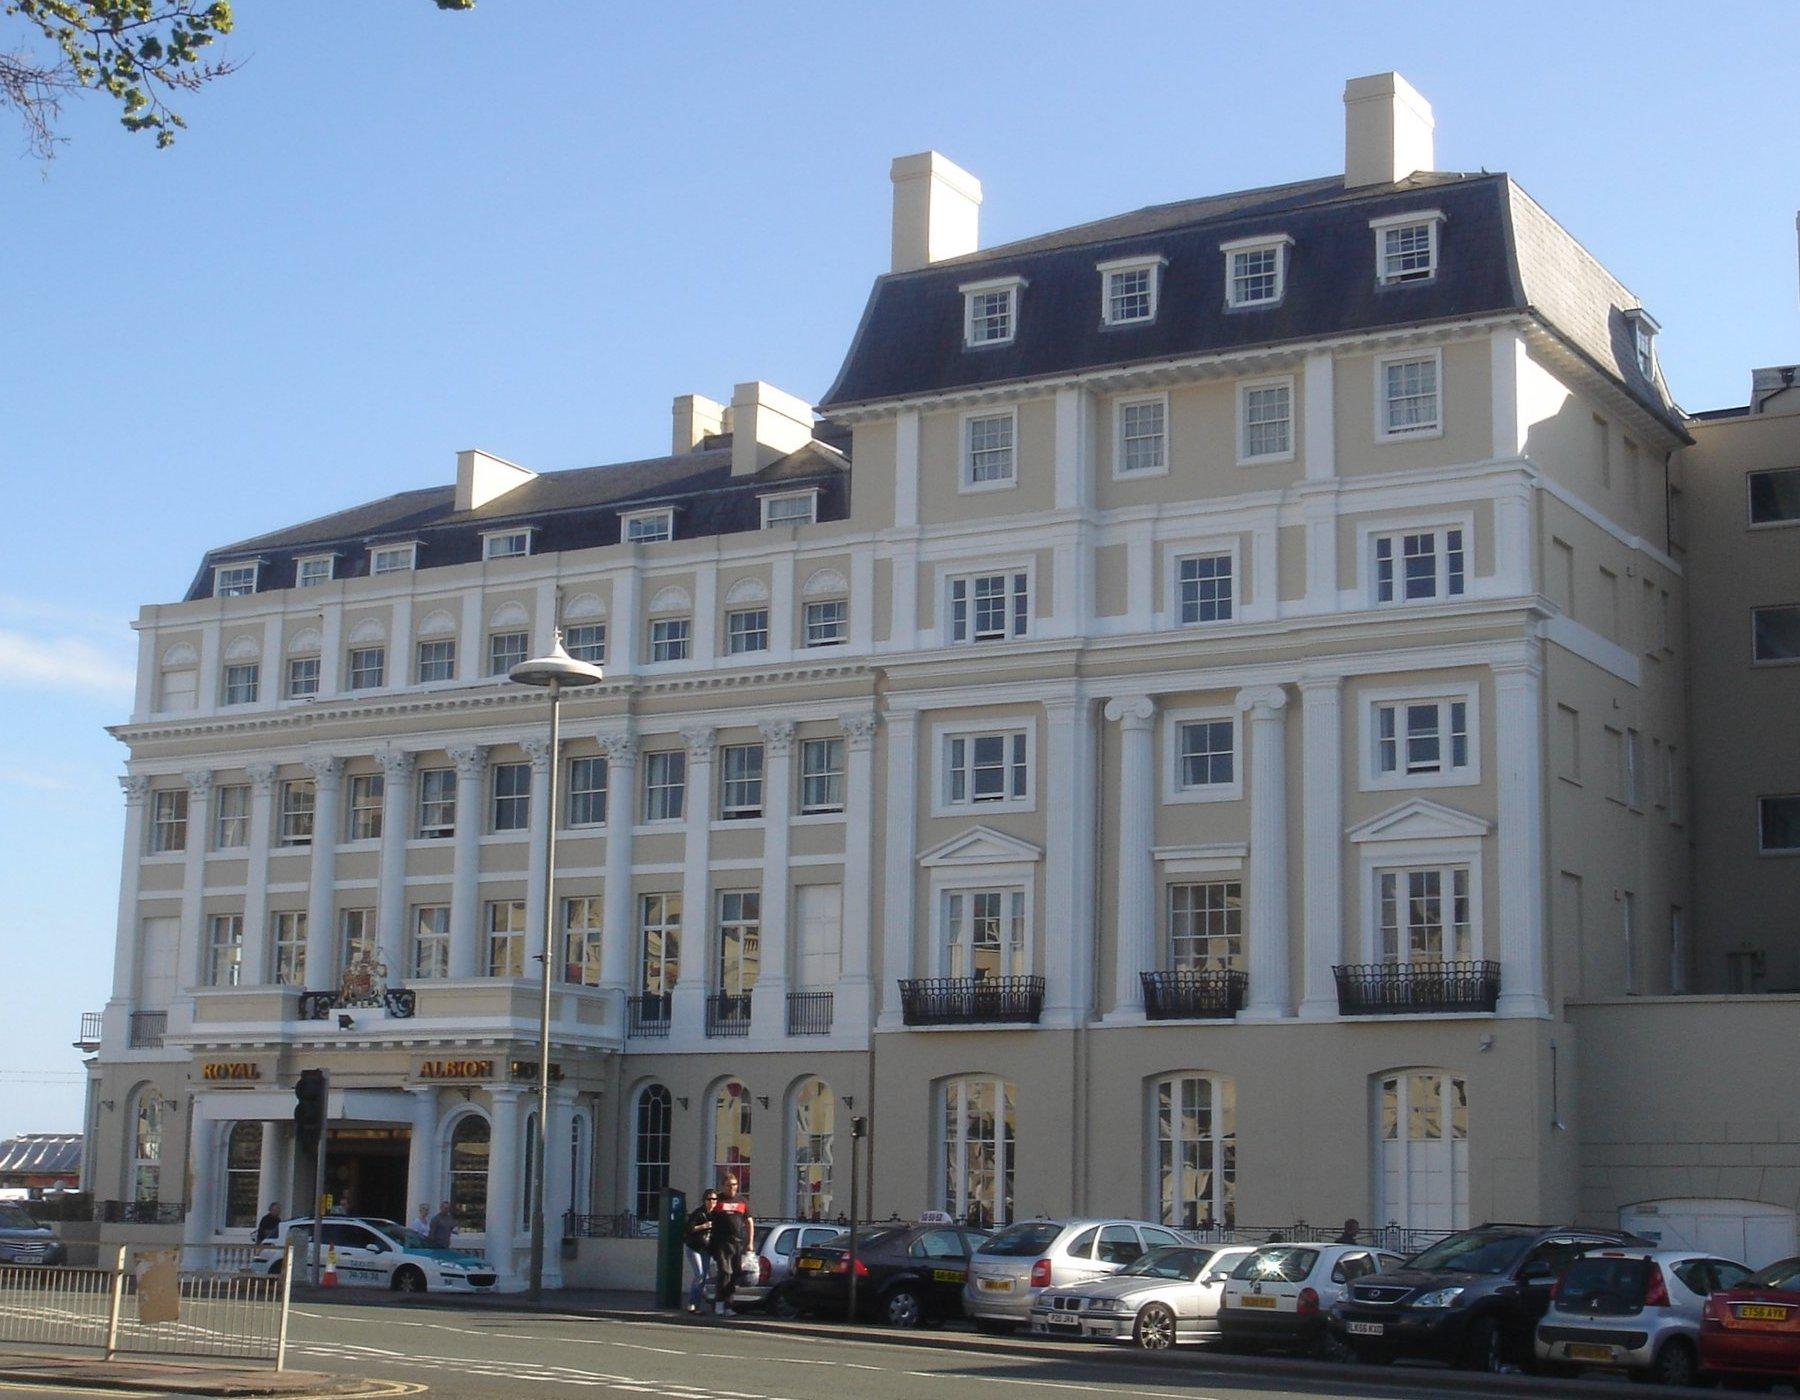 Royal Albion Hotel Brighton Fire